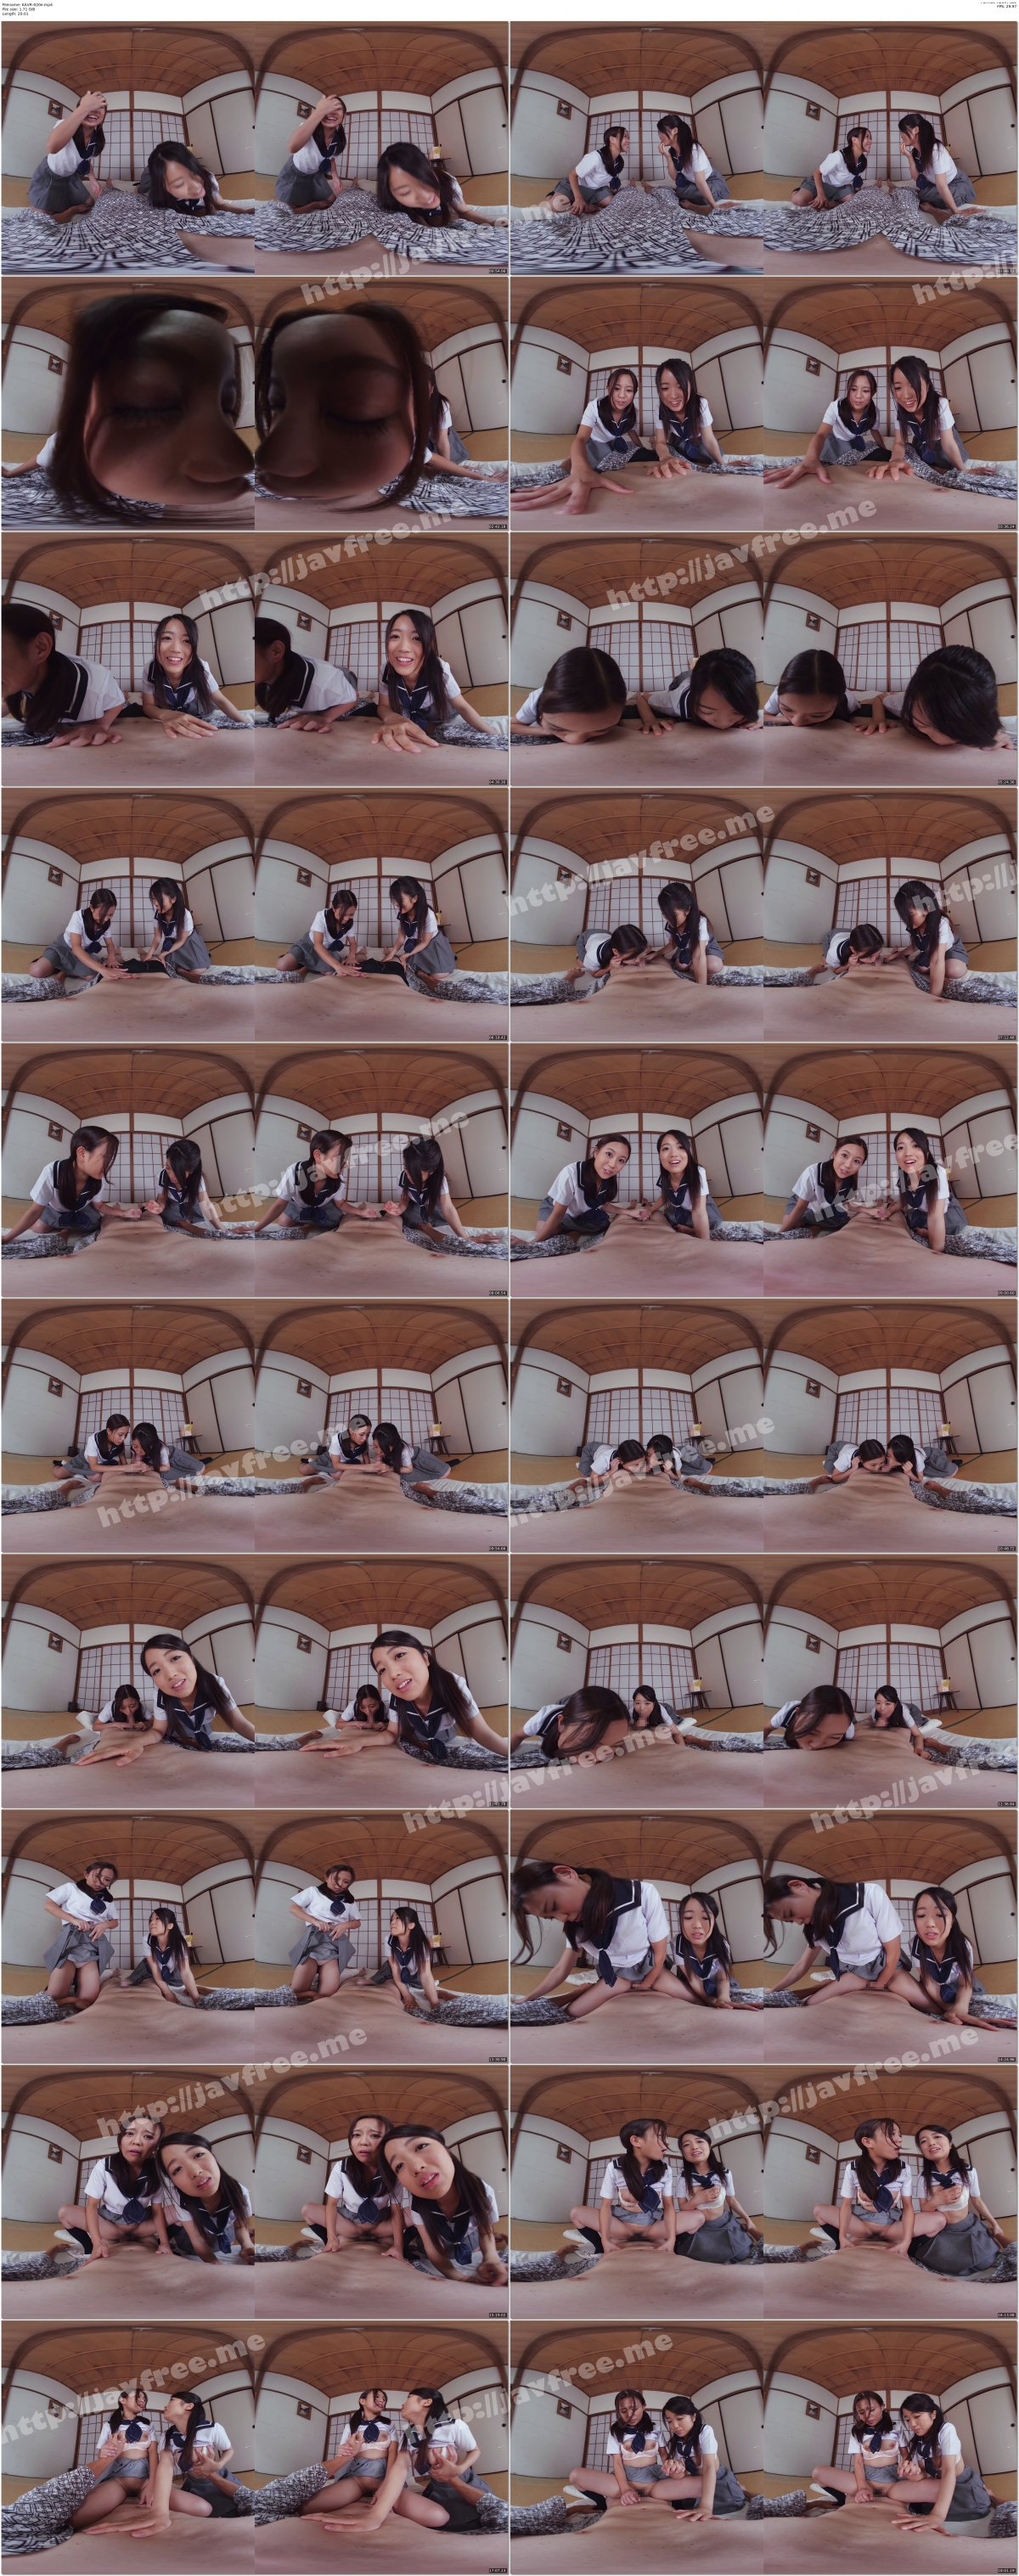 [KAVR-020] 【VR】夜這い村 男が一人もいない集落に迷い込んだ俺 神谷充希 一ノ瀬梓 美保結衣 葉月もえ - image KAVR-020e on https://javfree.me